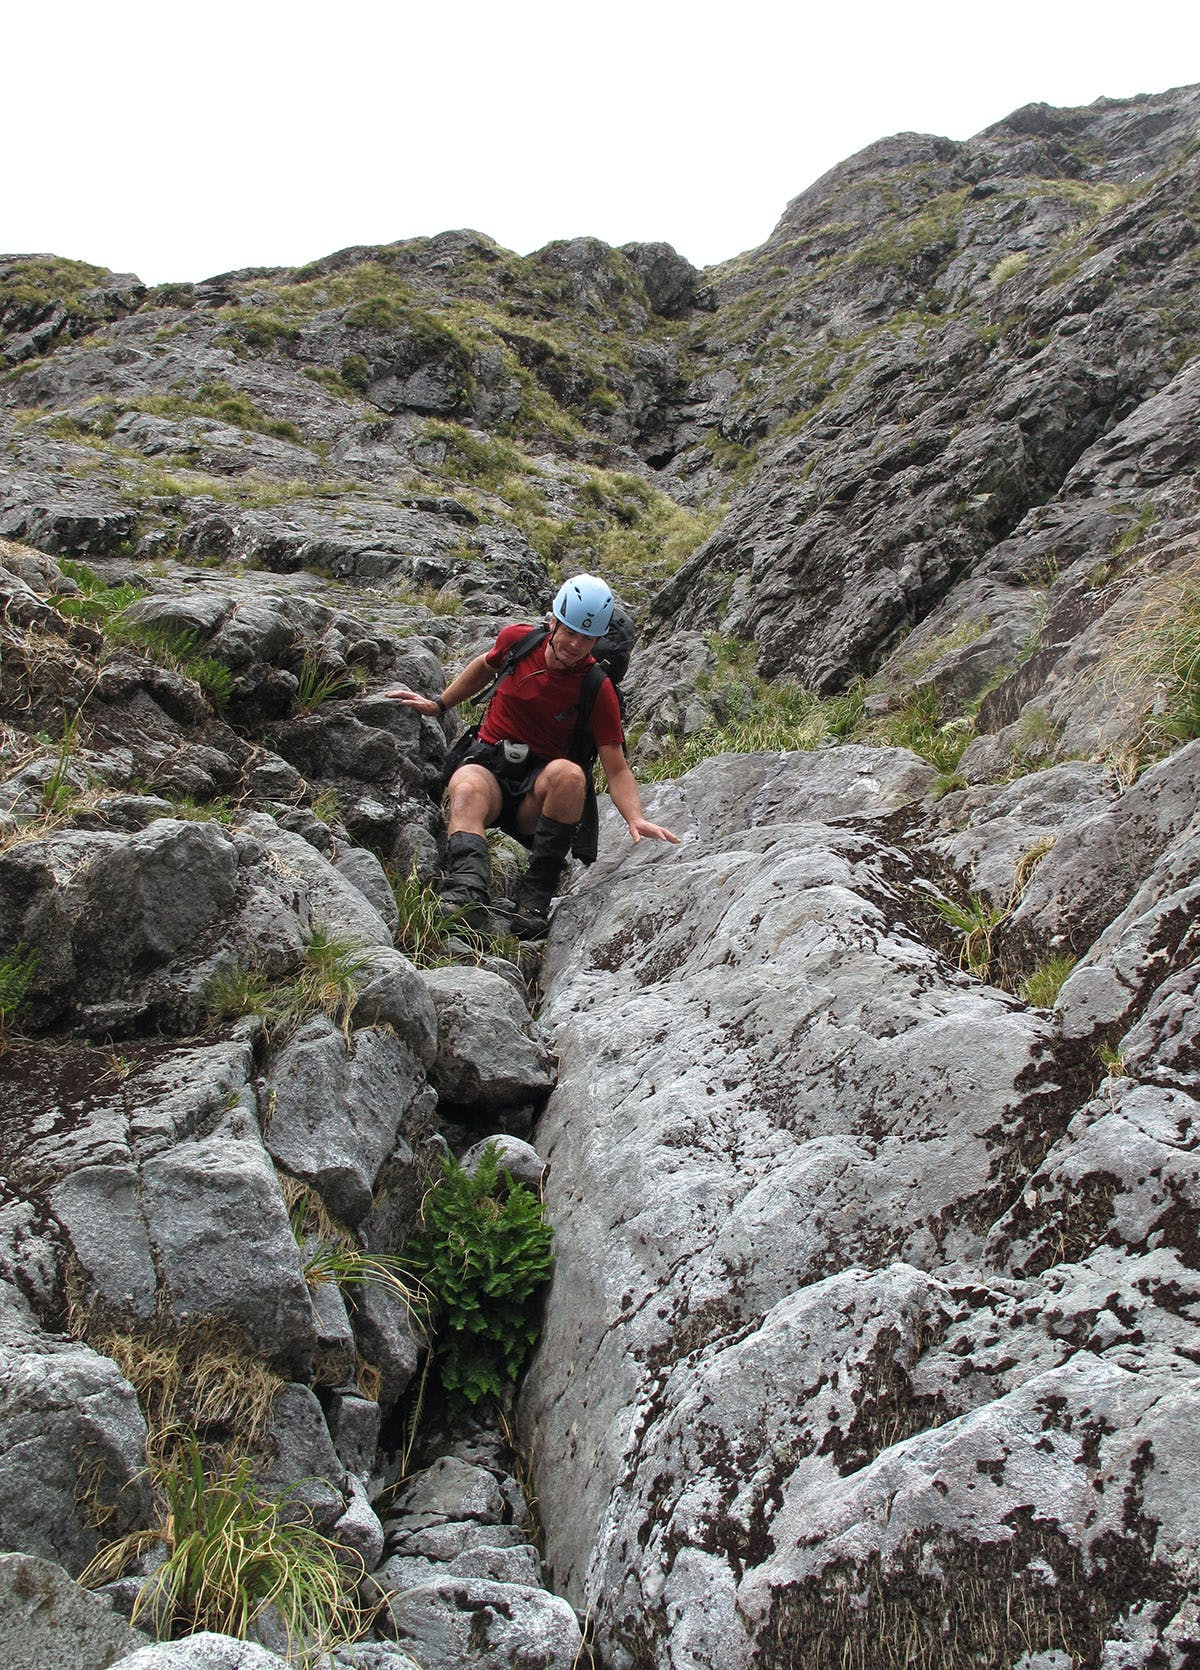 Descending the rocky chute that is Gifford Gap. Photo: Richard Daviss